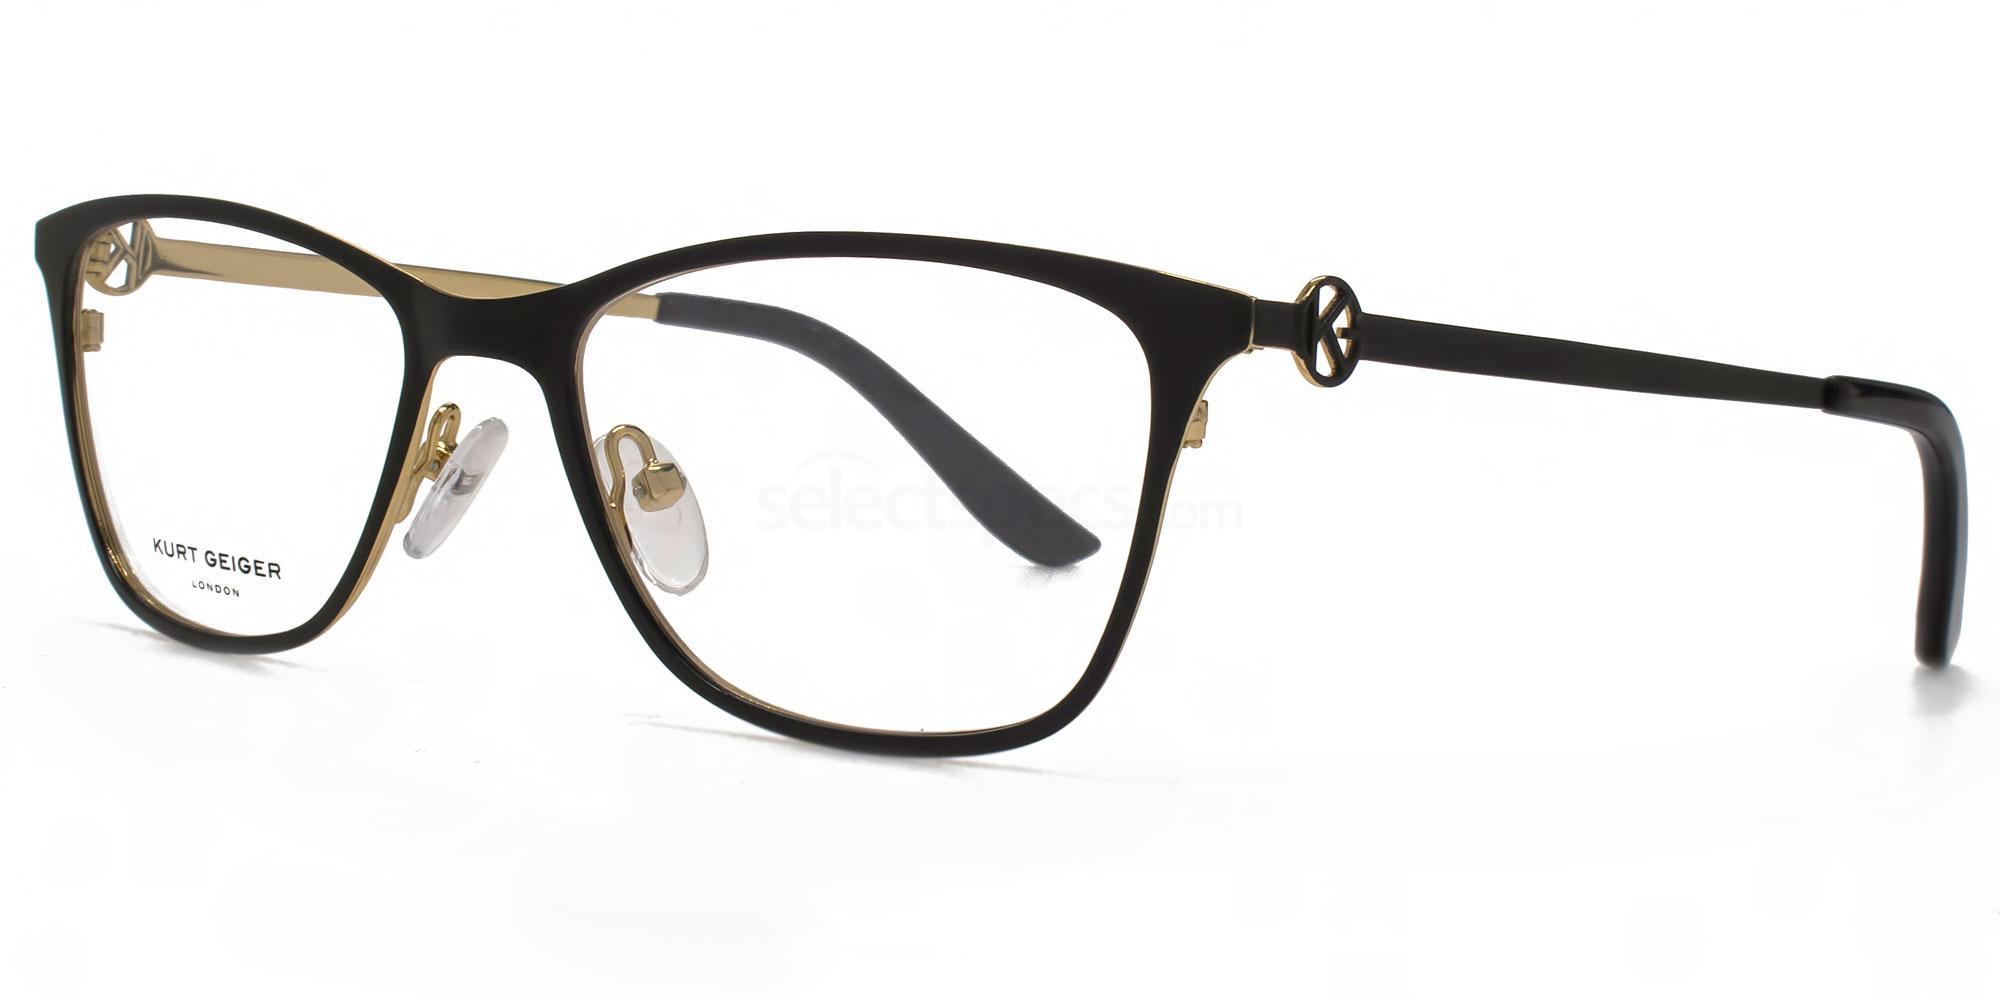 BLK KGS001 - AVA Glasses, Kurt Geiger London